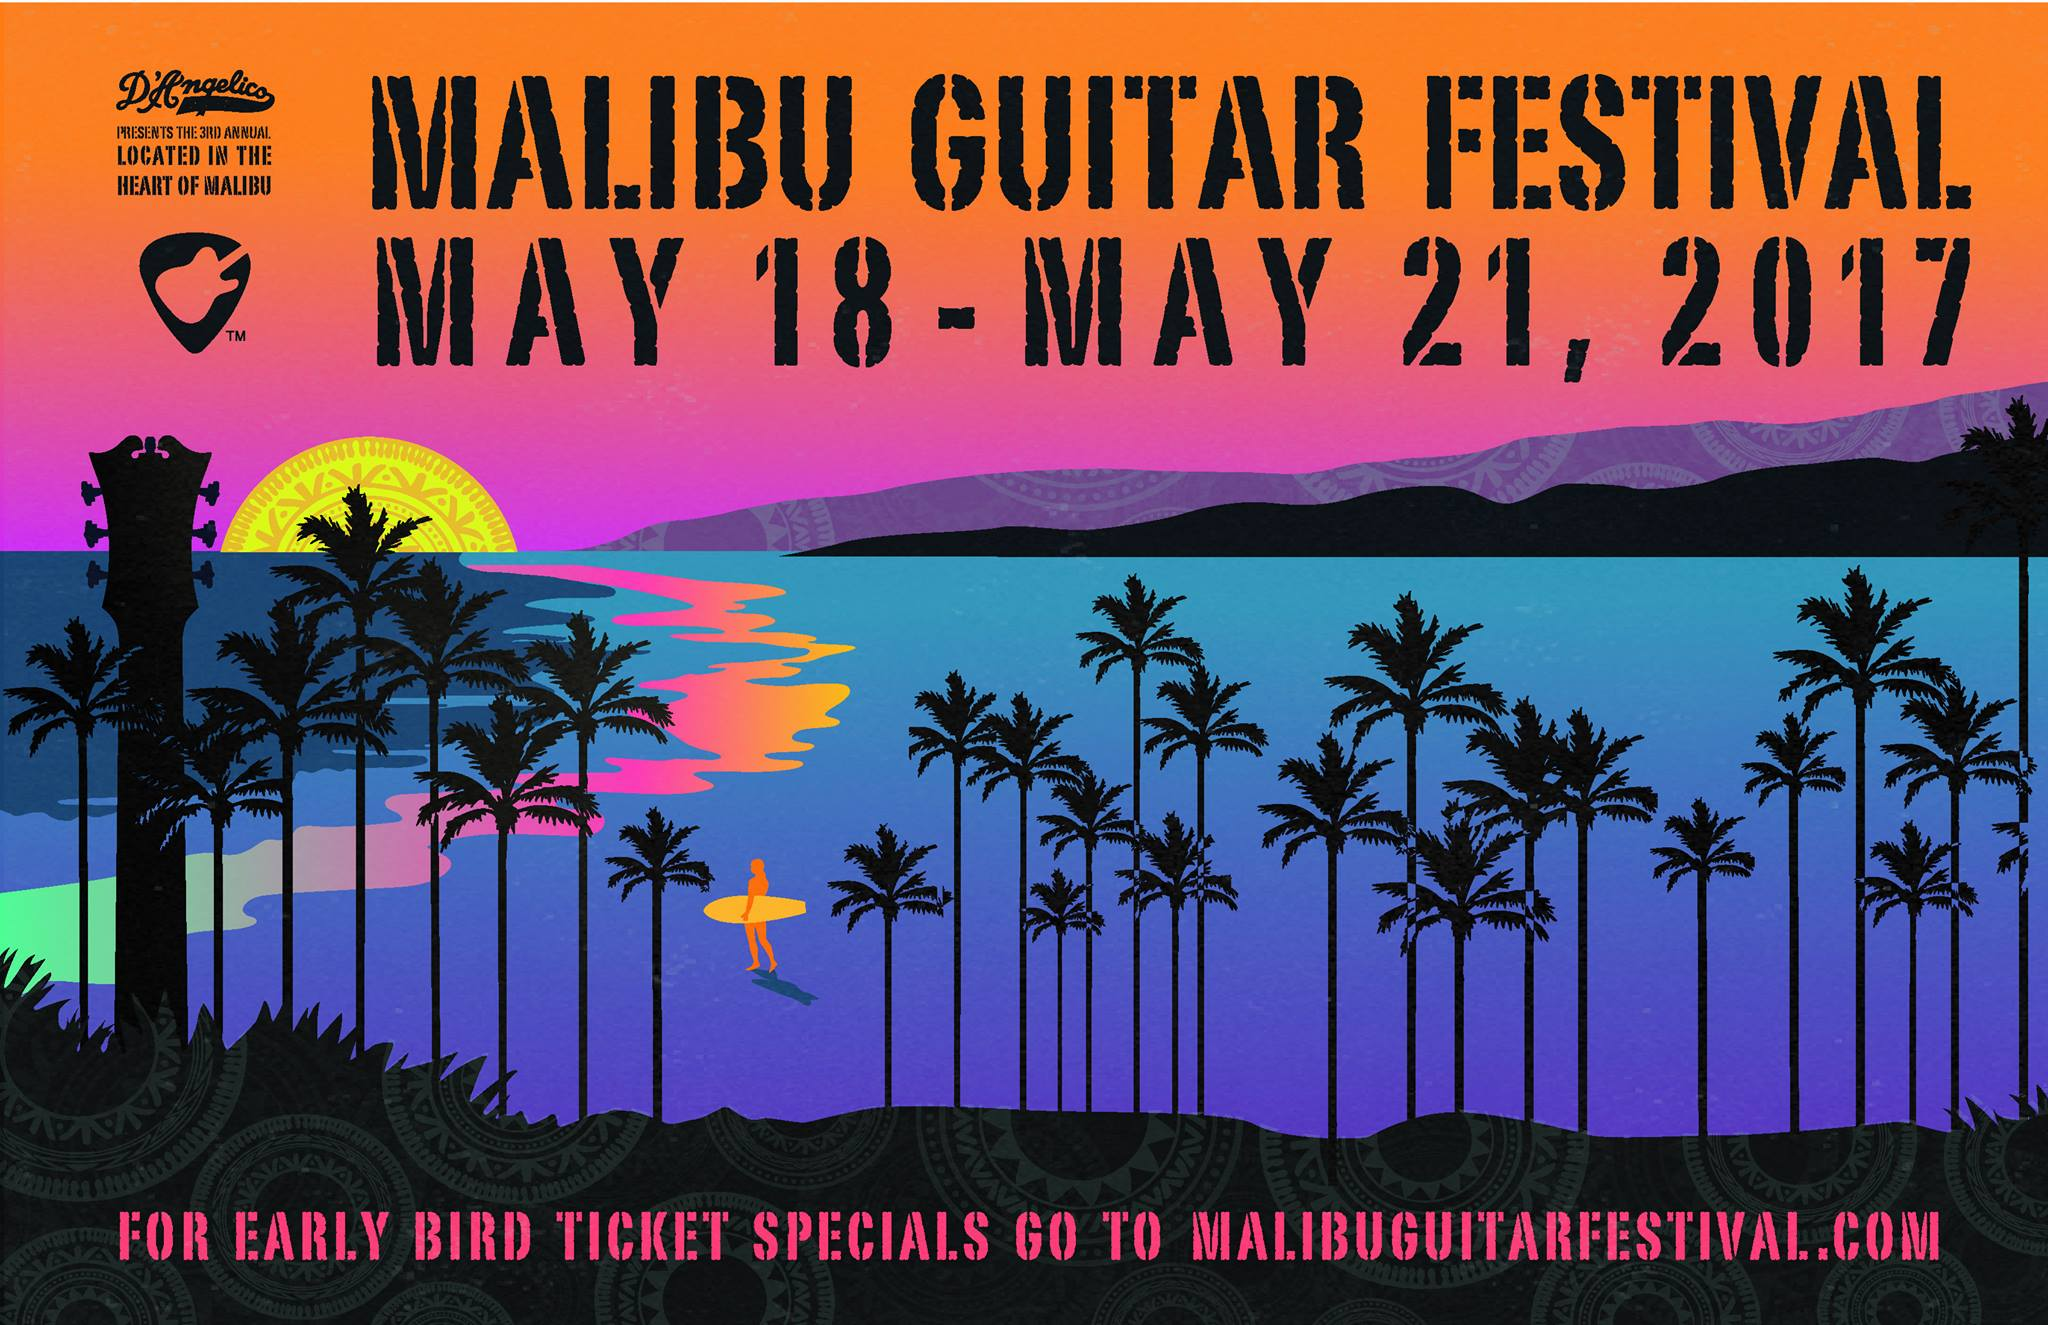 The 3rd Annual Malibu Guitar Festival: Mick Fleetwood and Steve Vai Headline!